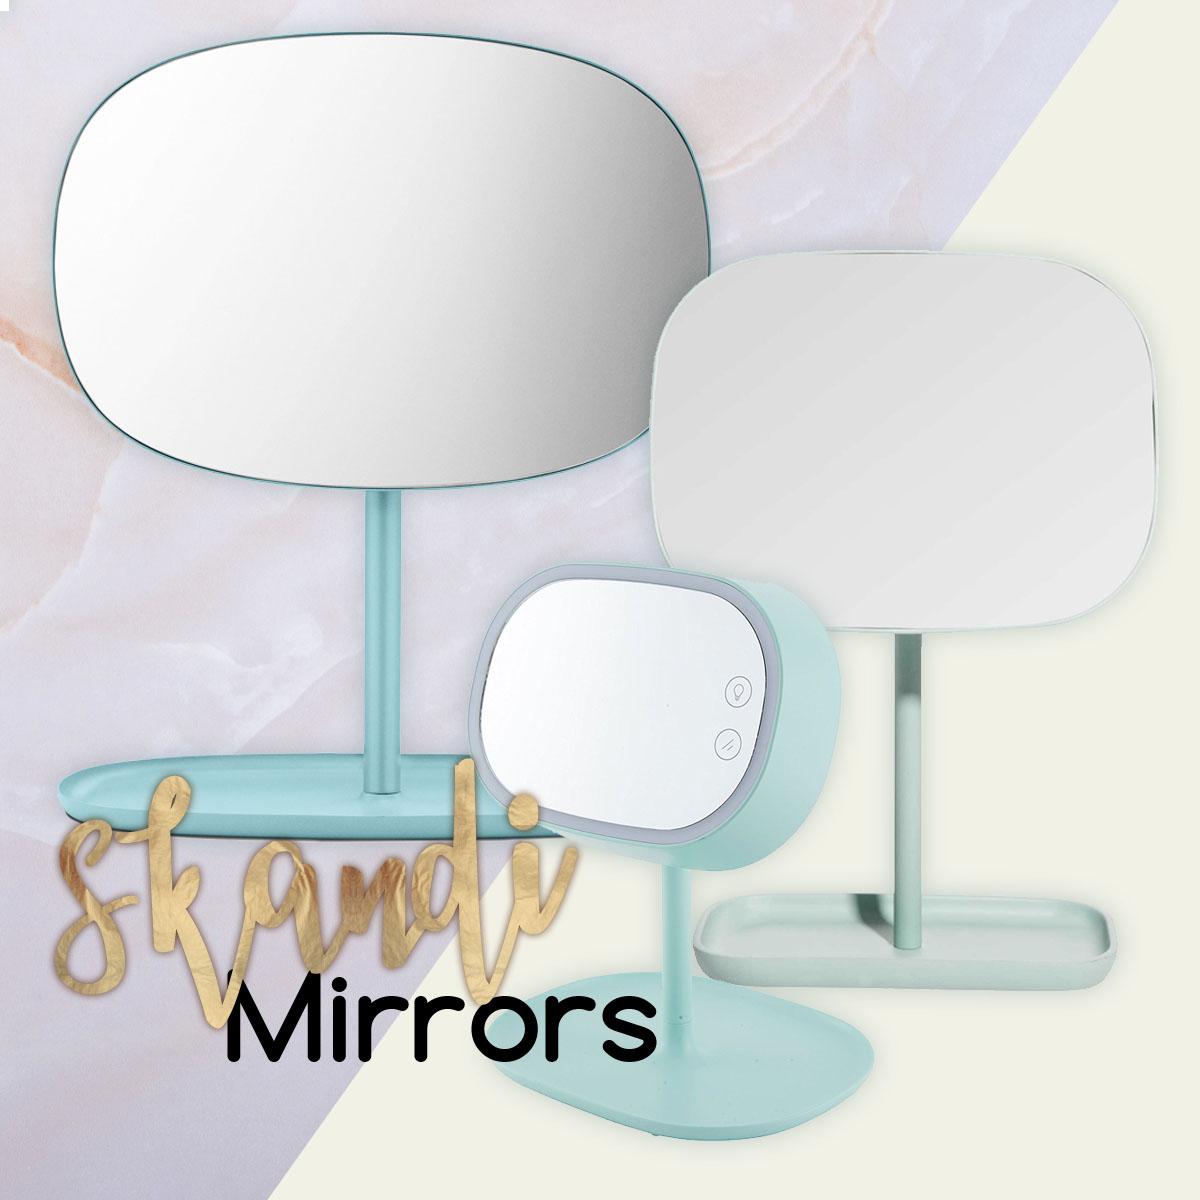 normann copenhagen flip alternative dupe lookalike skandi makeup mirror